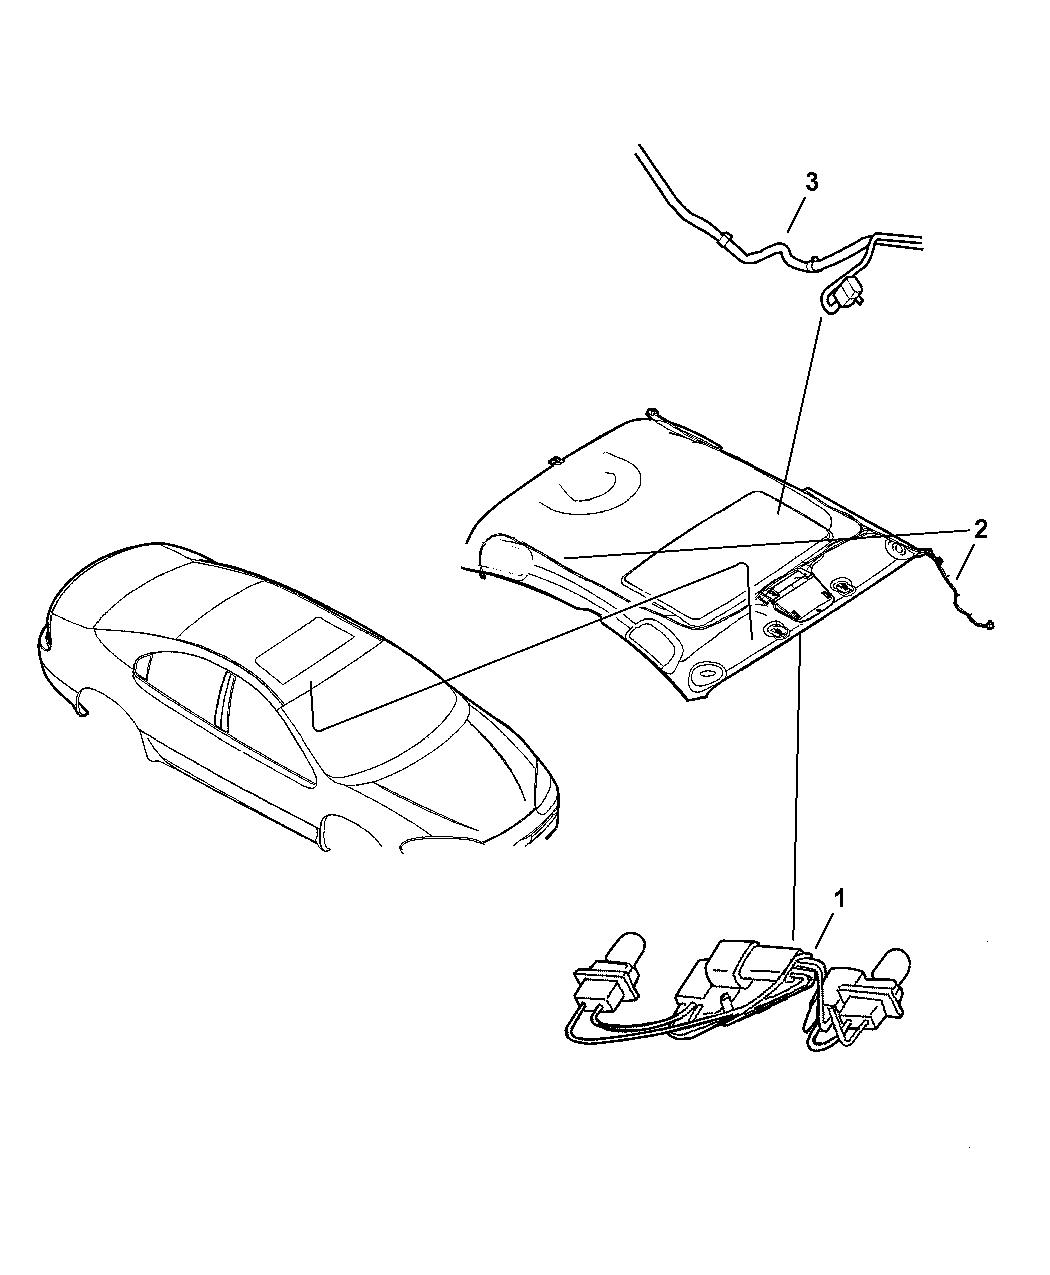 2002 Chrysler Concorde Wiring Roof Mopar Parts Giant Diagram